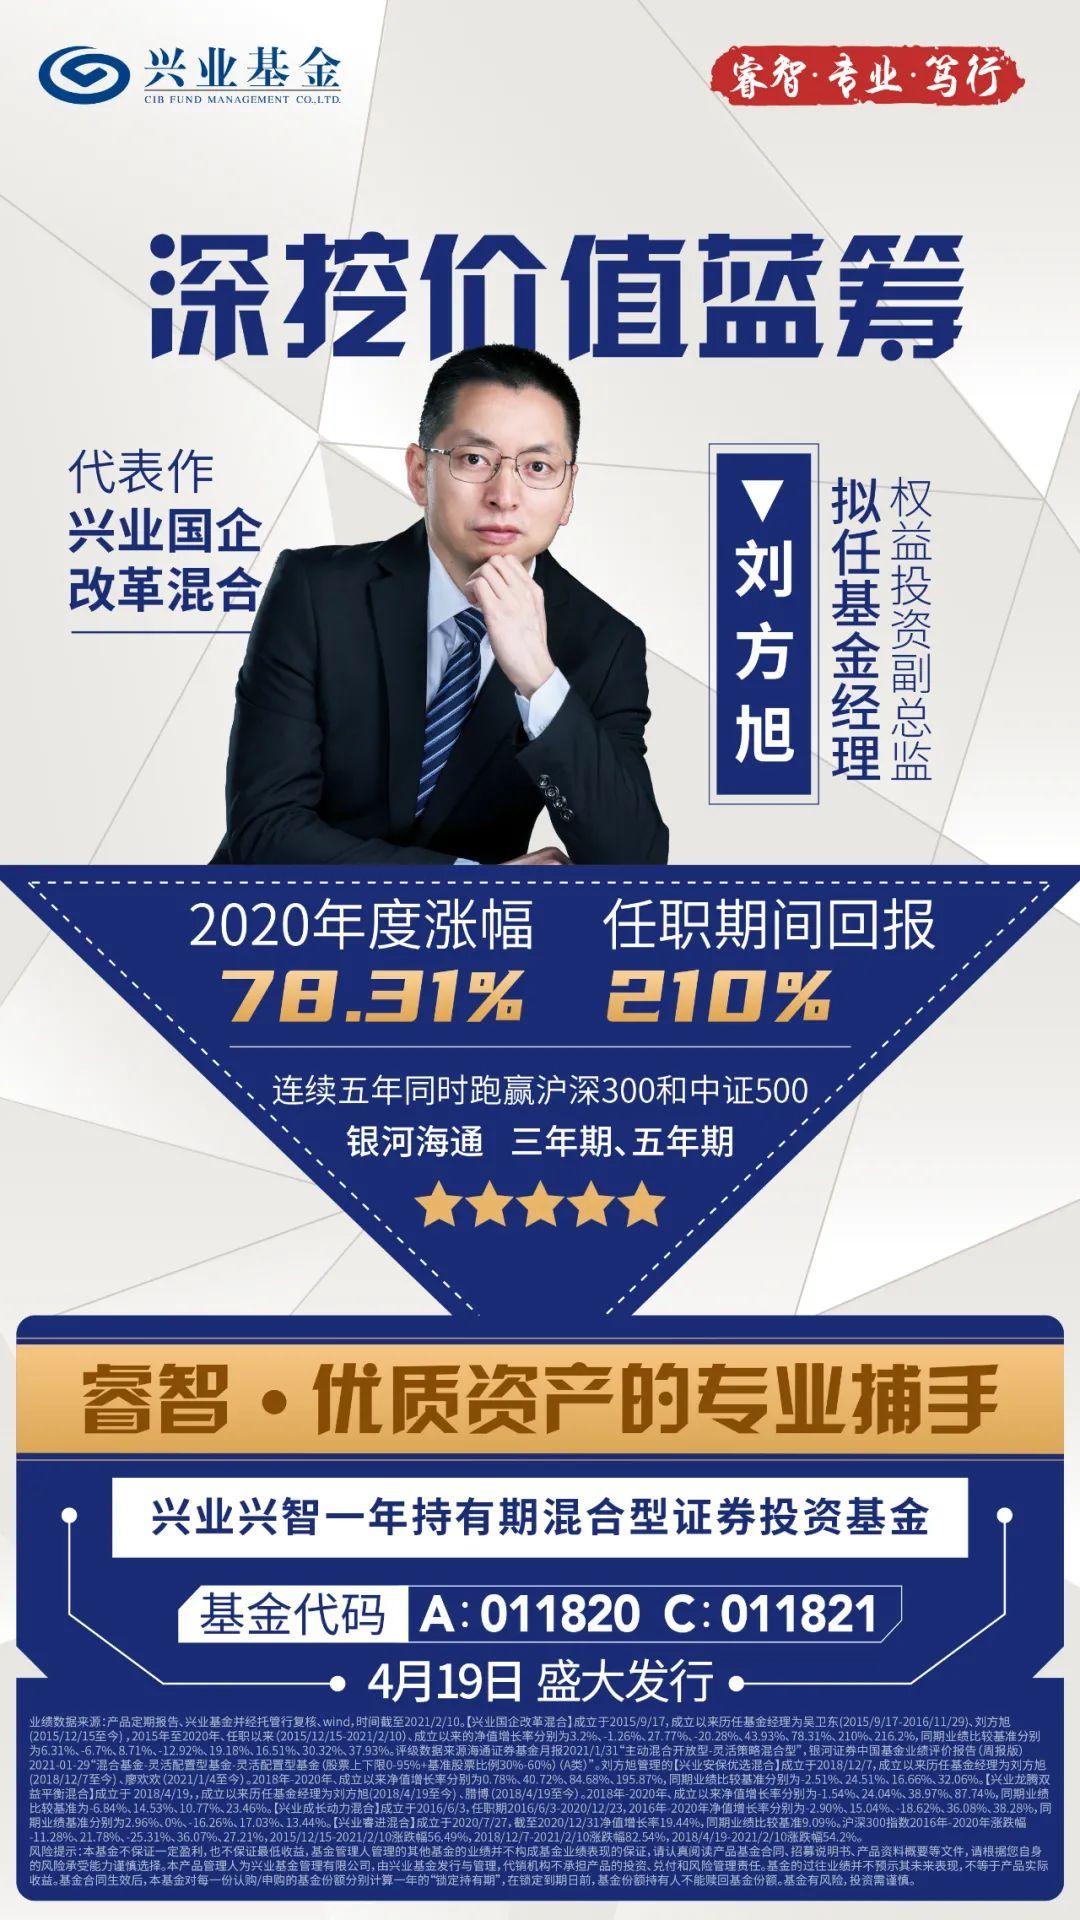 兴•基荟【2021年4月23日】